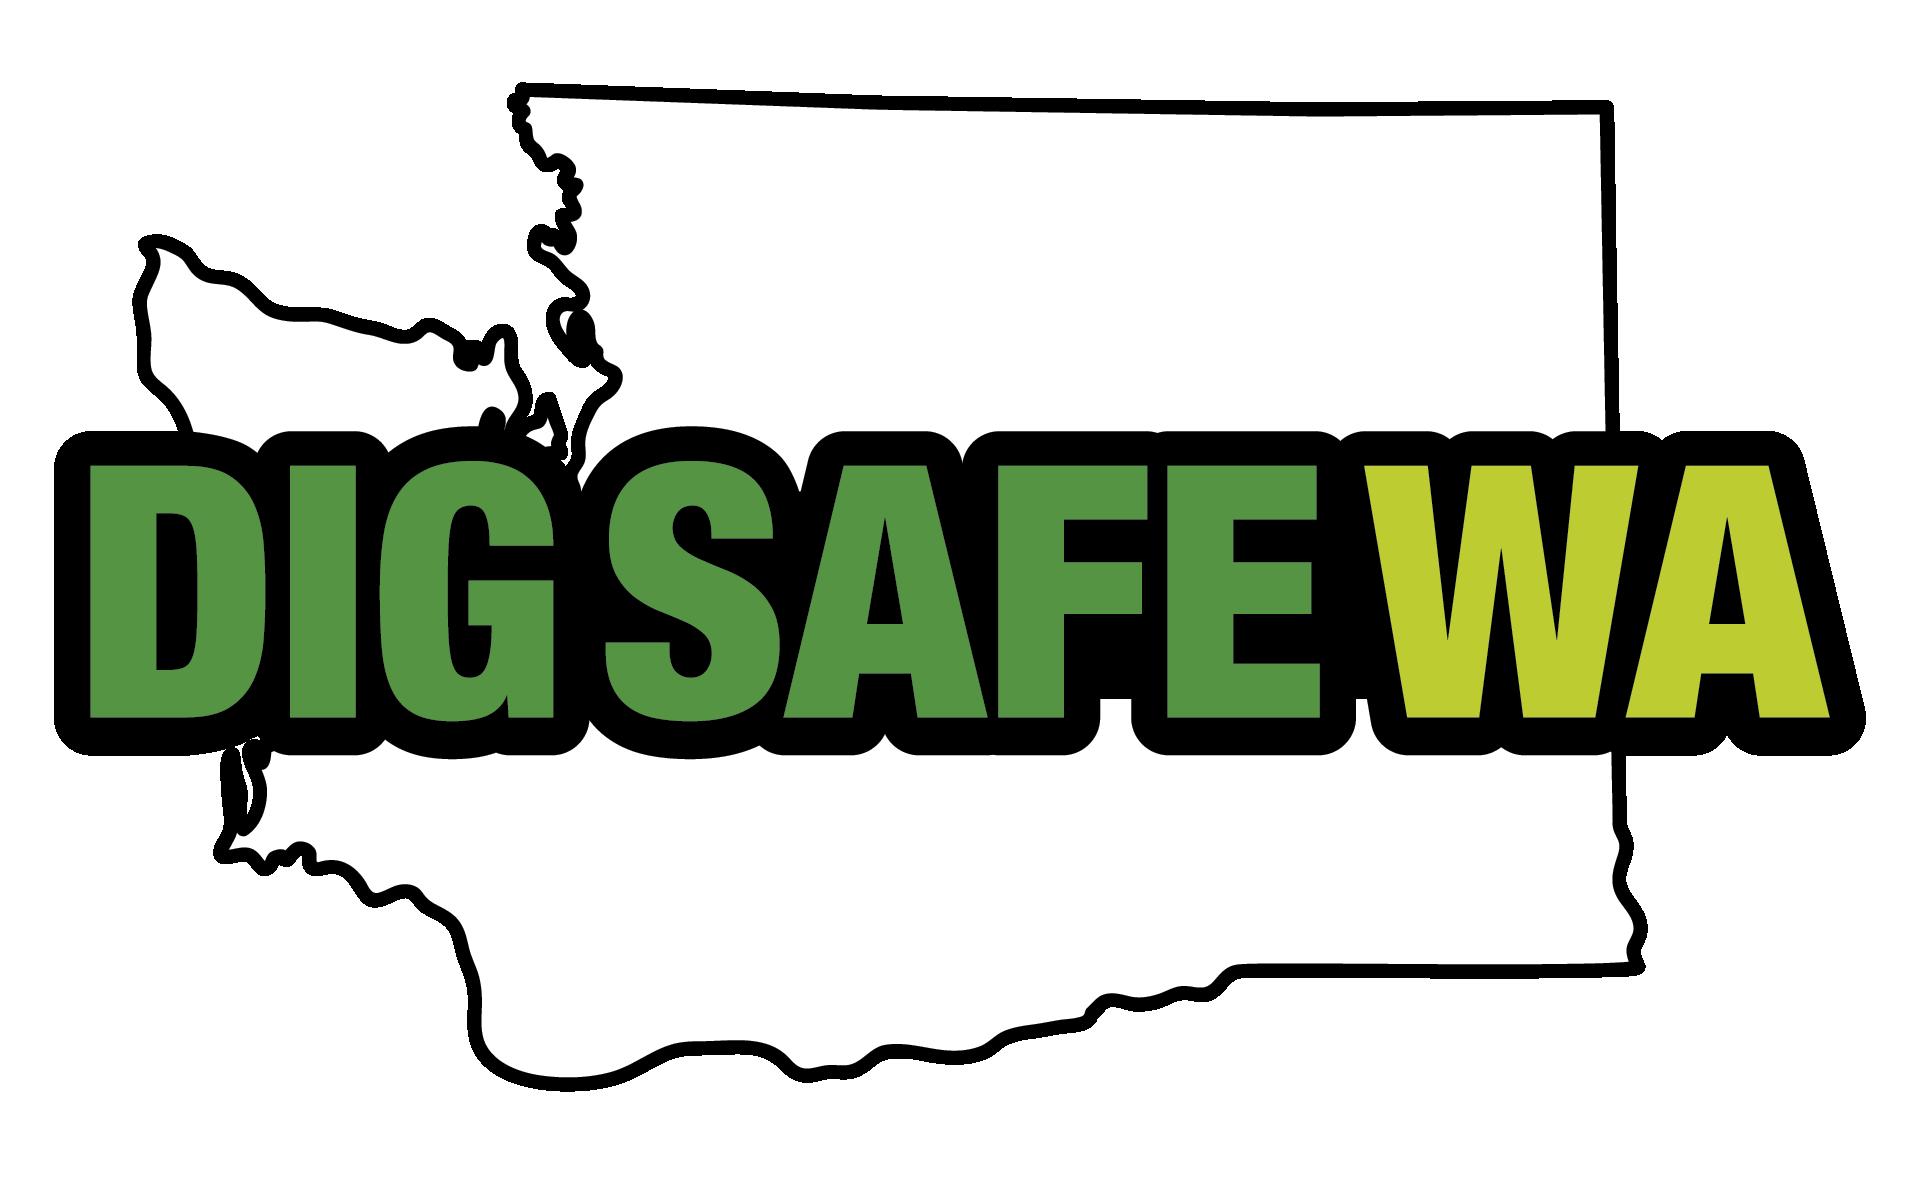 Dig Safe Washington